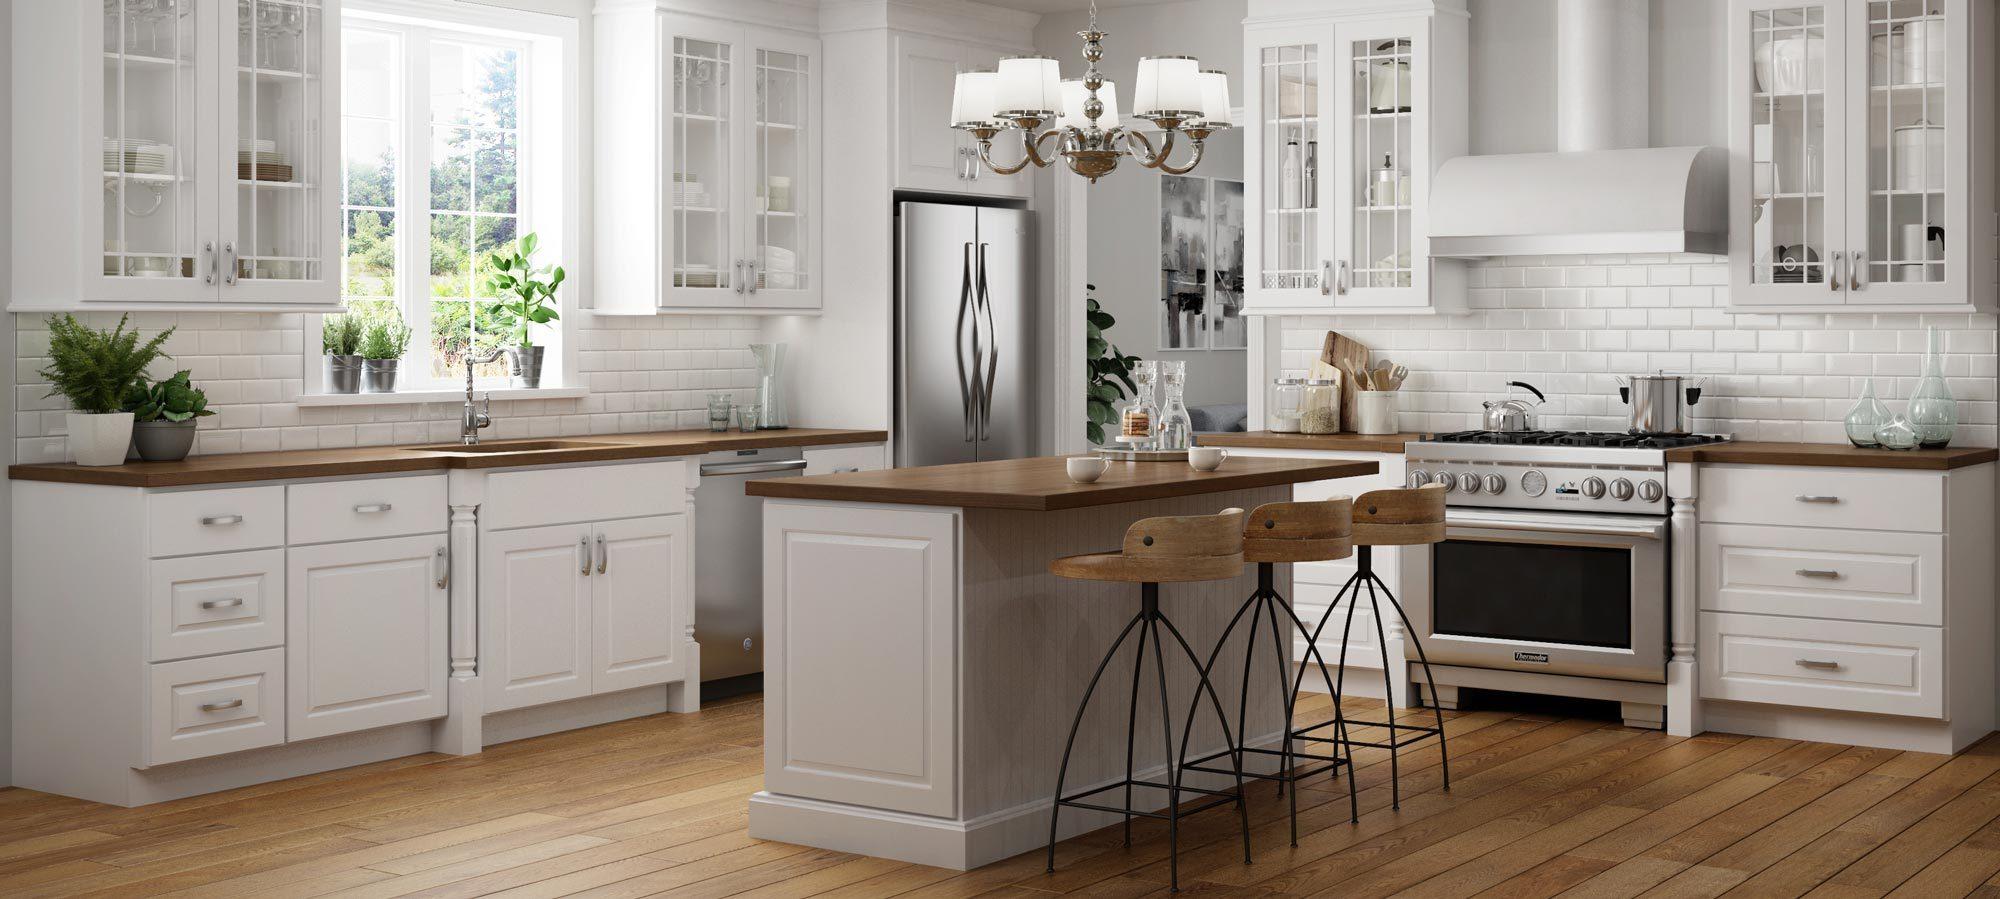 Hero_Free-Kitchen-Design